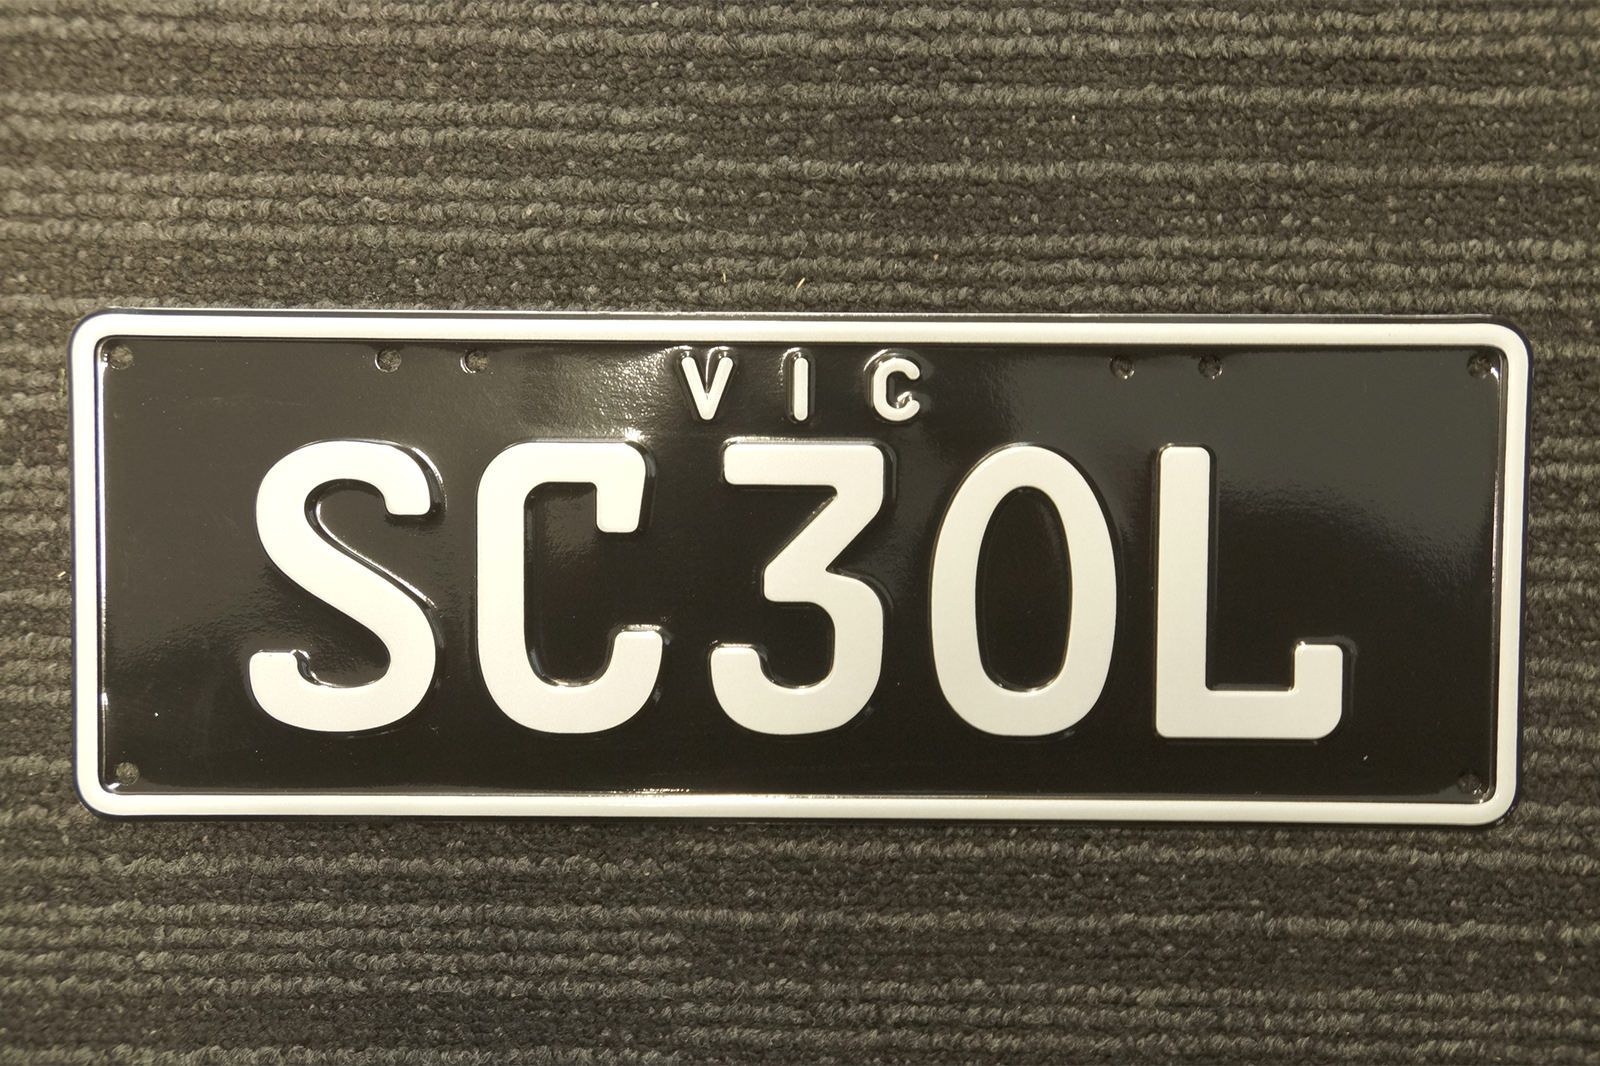 Victorian Personal Plates - 'SC 3OL'